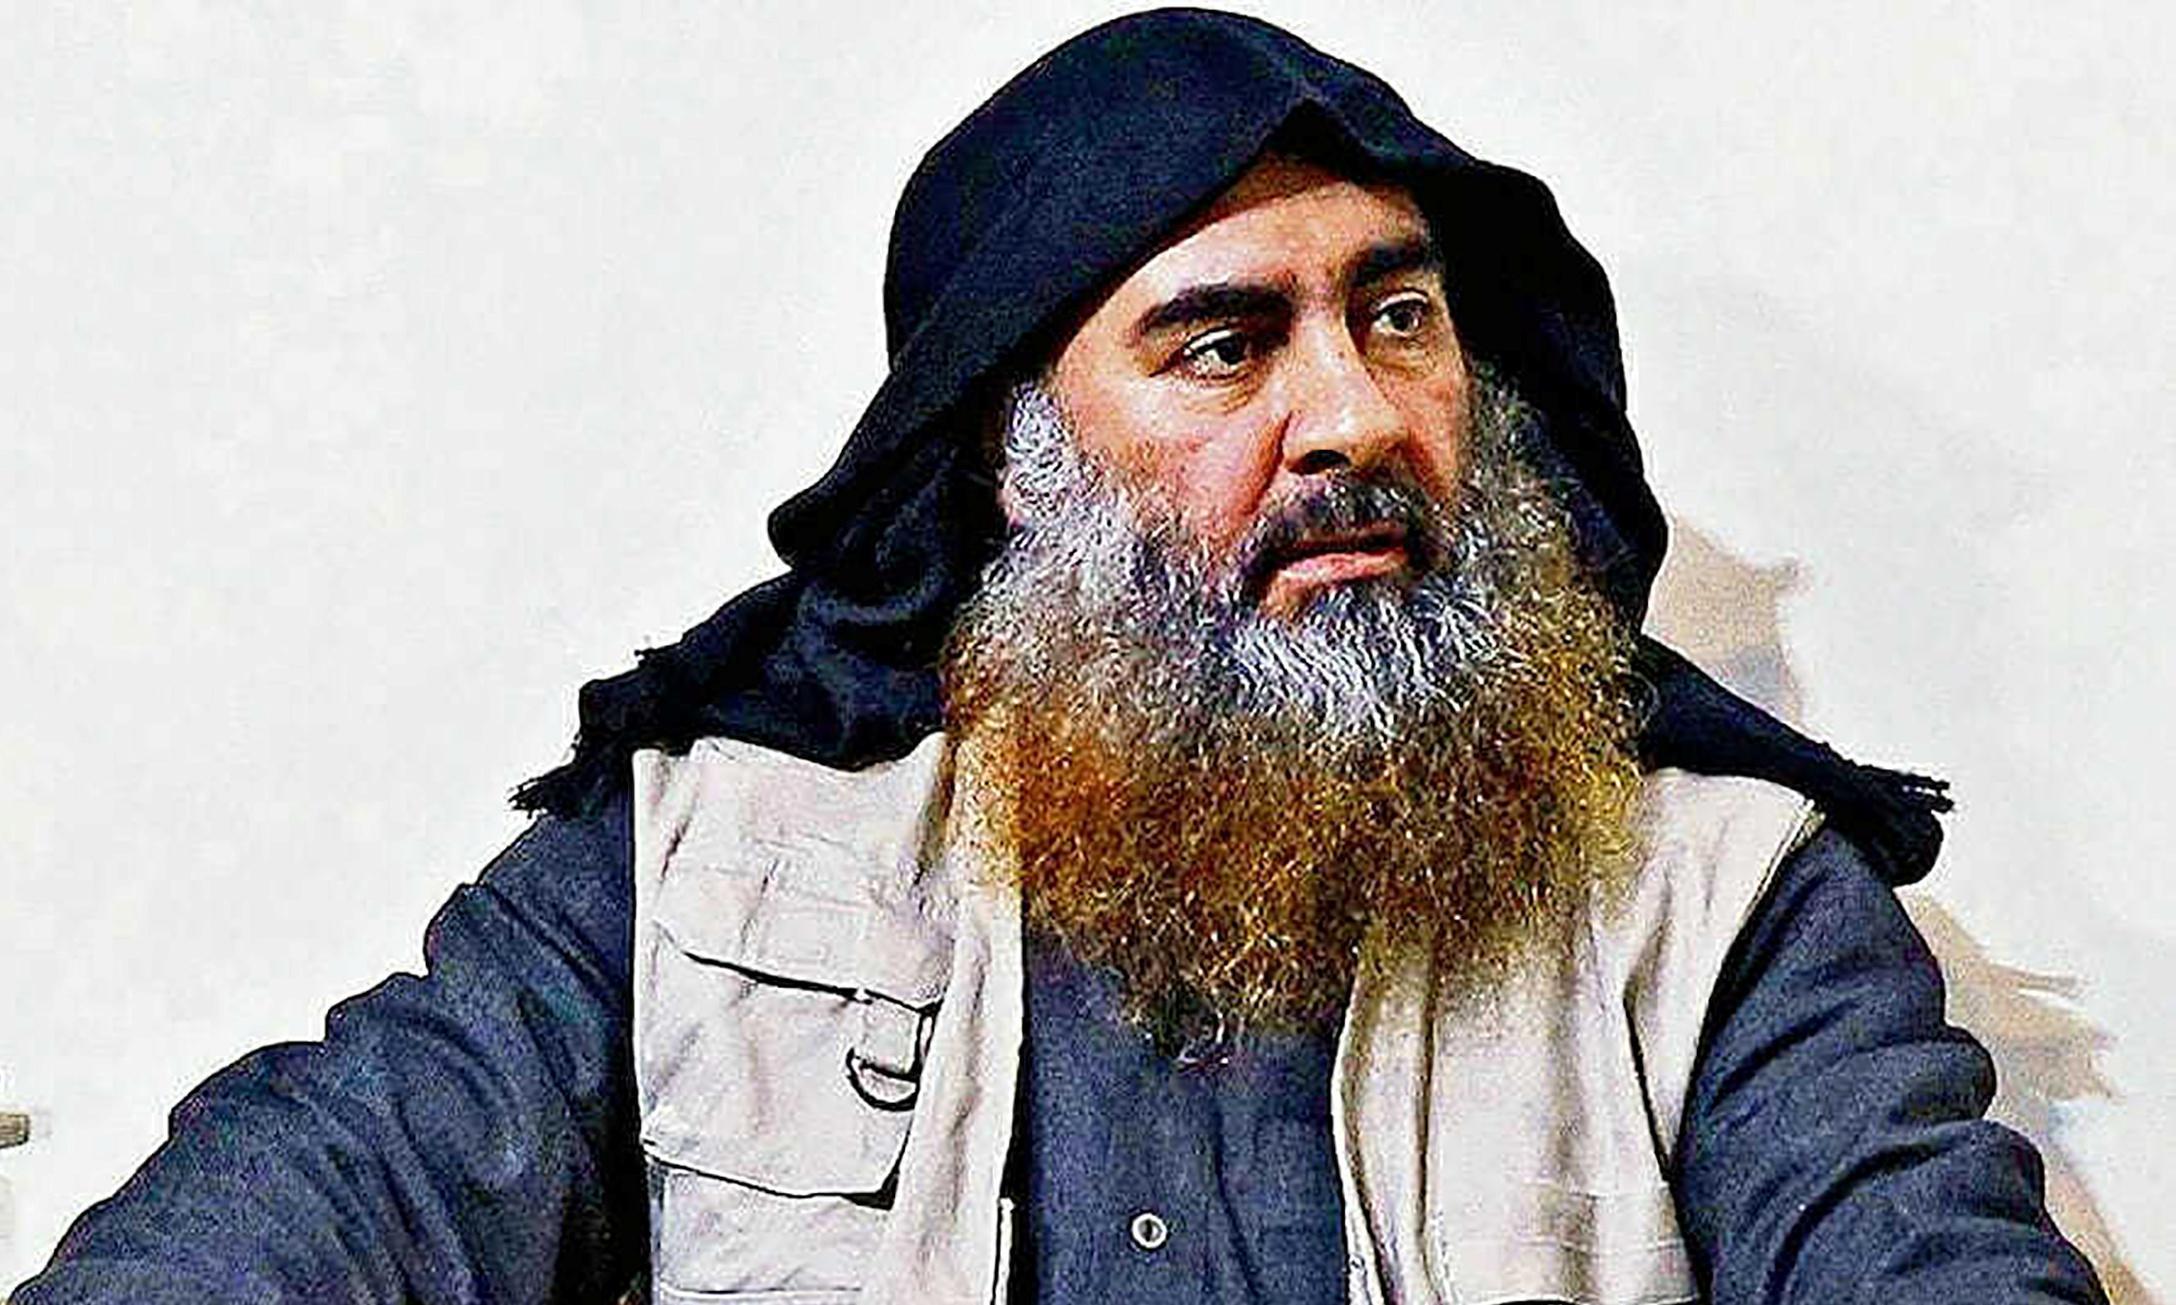 Islamic State names new leader after death of Abu Bakr al-Baghdadi